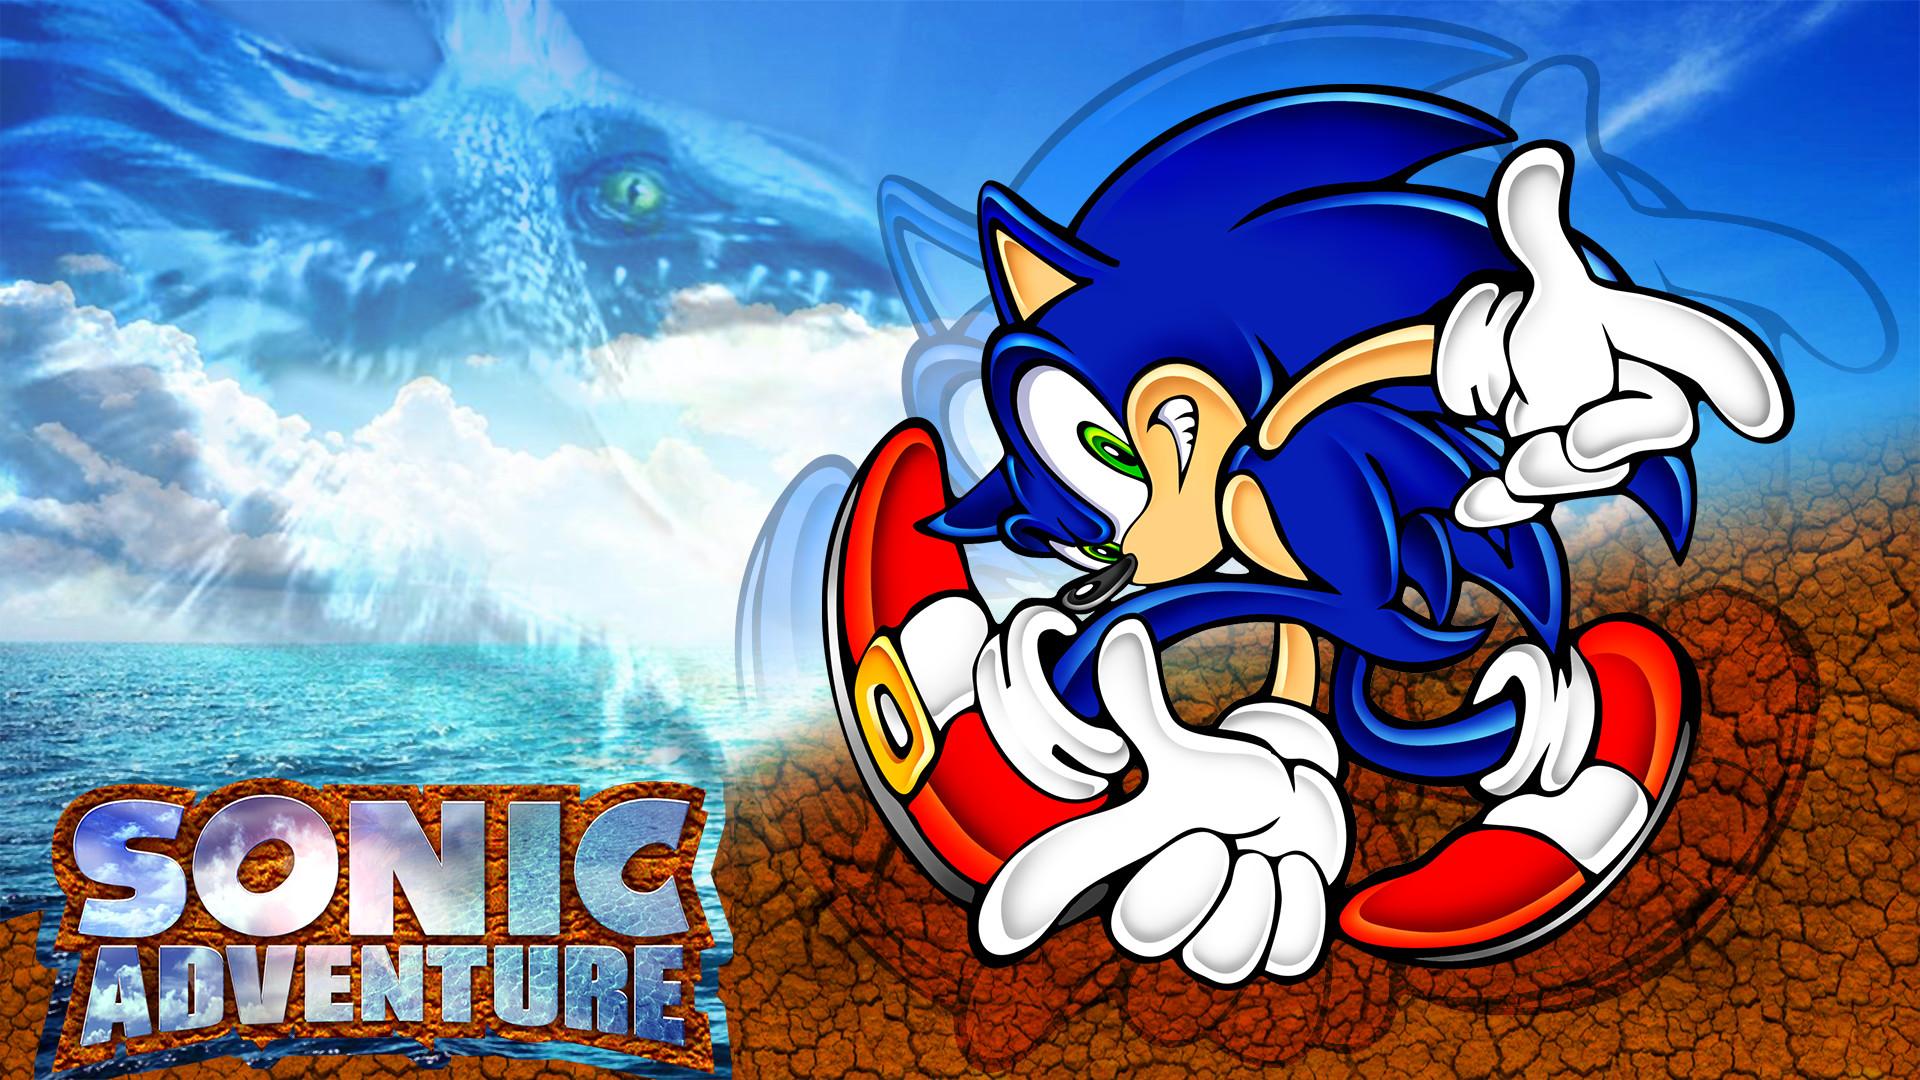 sonic adventure details launchbox games database